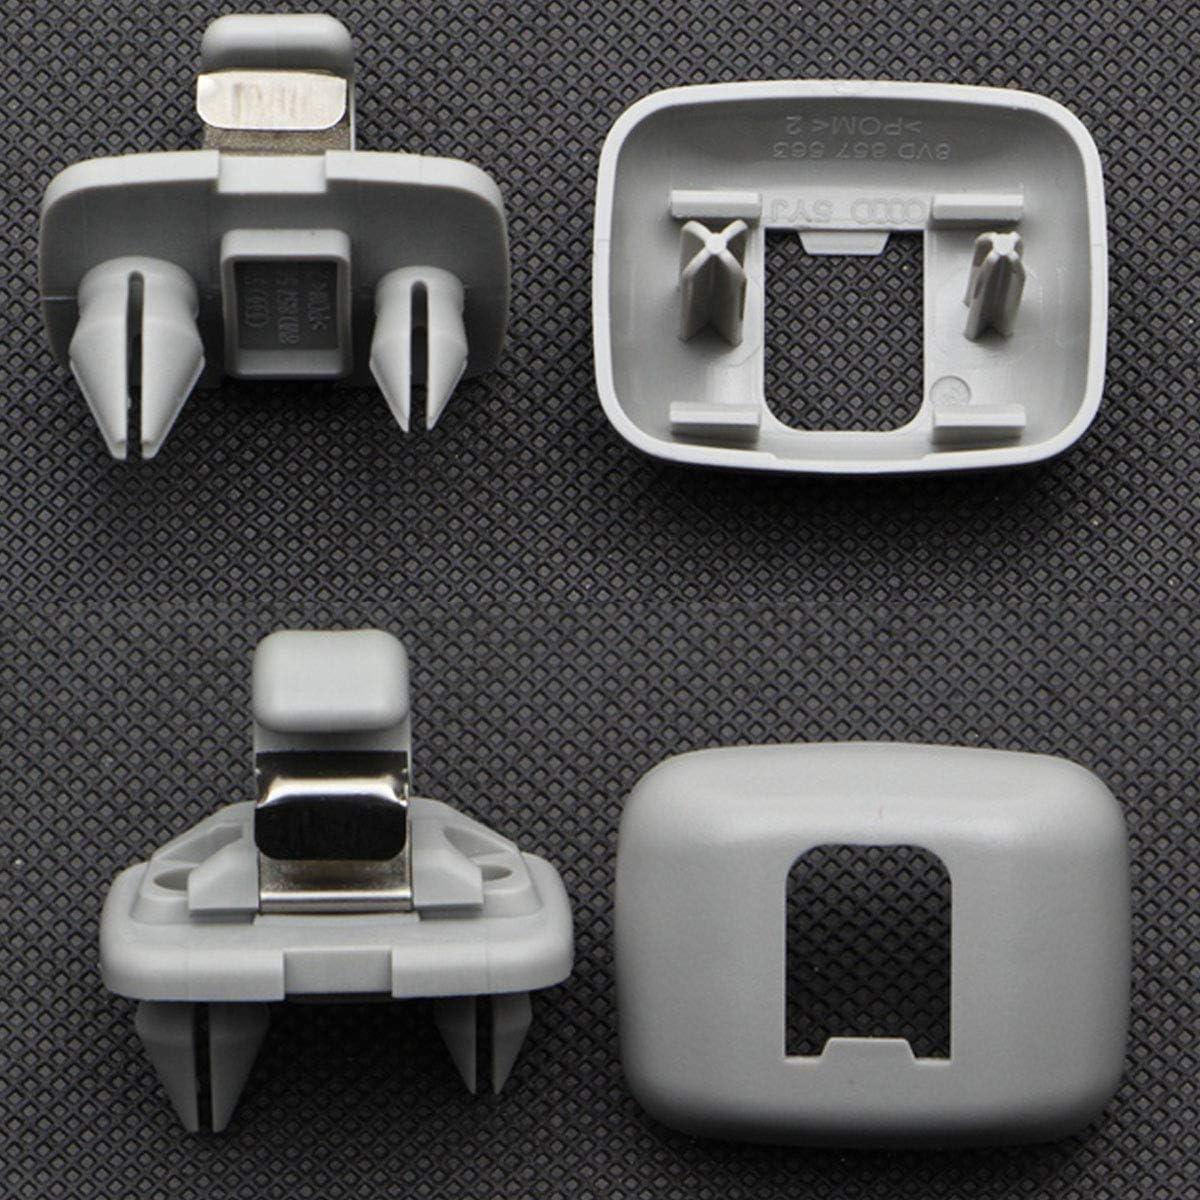 XUNGED Queue Antibrouillard Couverture Arri/ère Brouillard Arri/ère Lampe Arri/ère Garniture Lampe Hoods Accessoires for Ford Ranger 2016 Accessoires T6 T7 T8 Wildtrak Raptor Color : Black